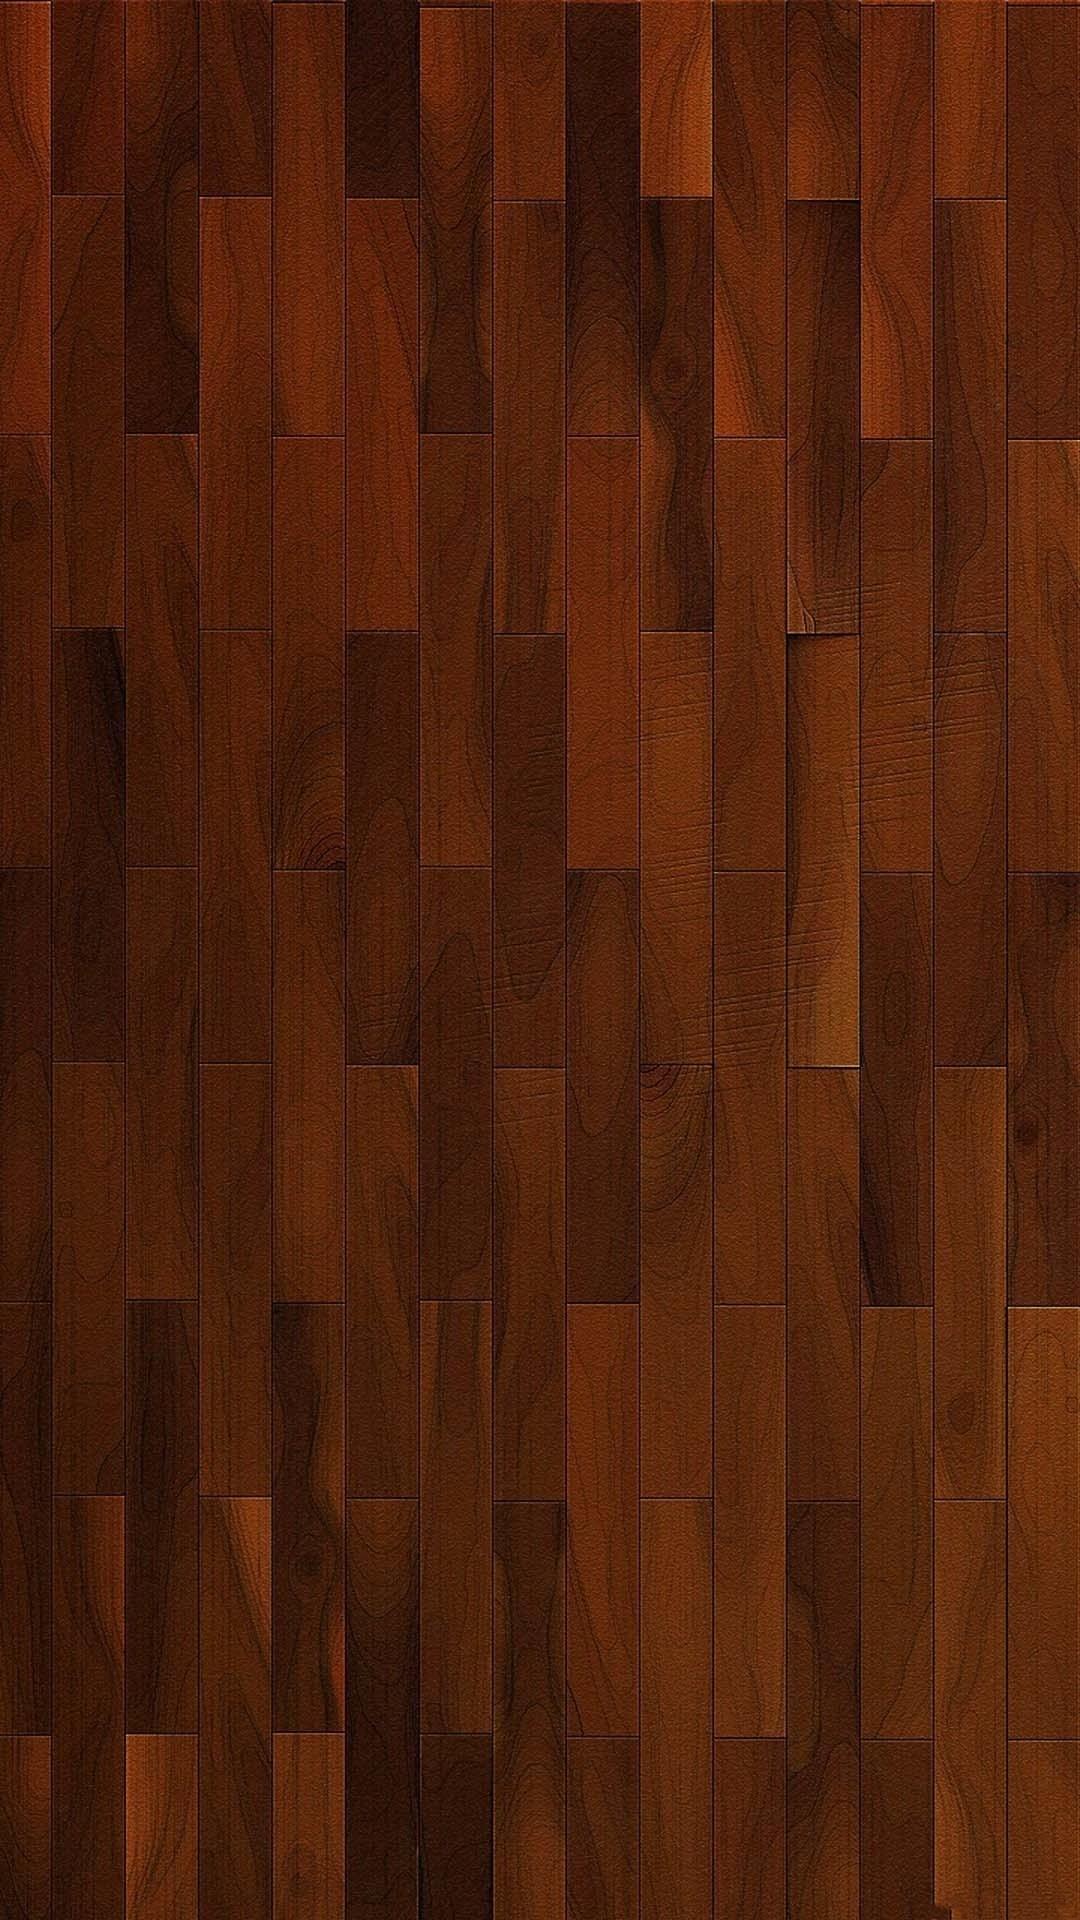 … Hardwood floor Digital Art mobile wallpaper